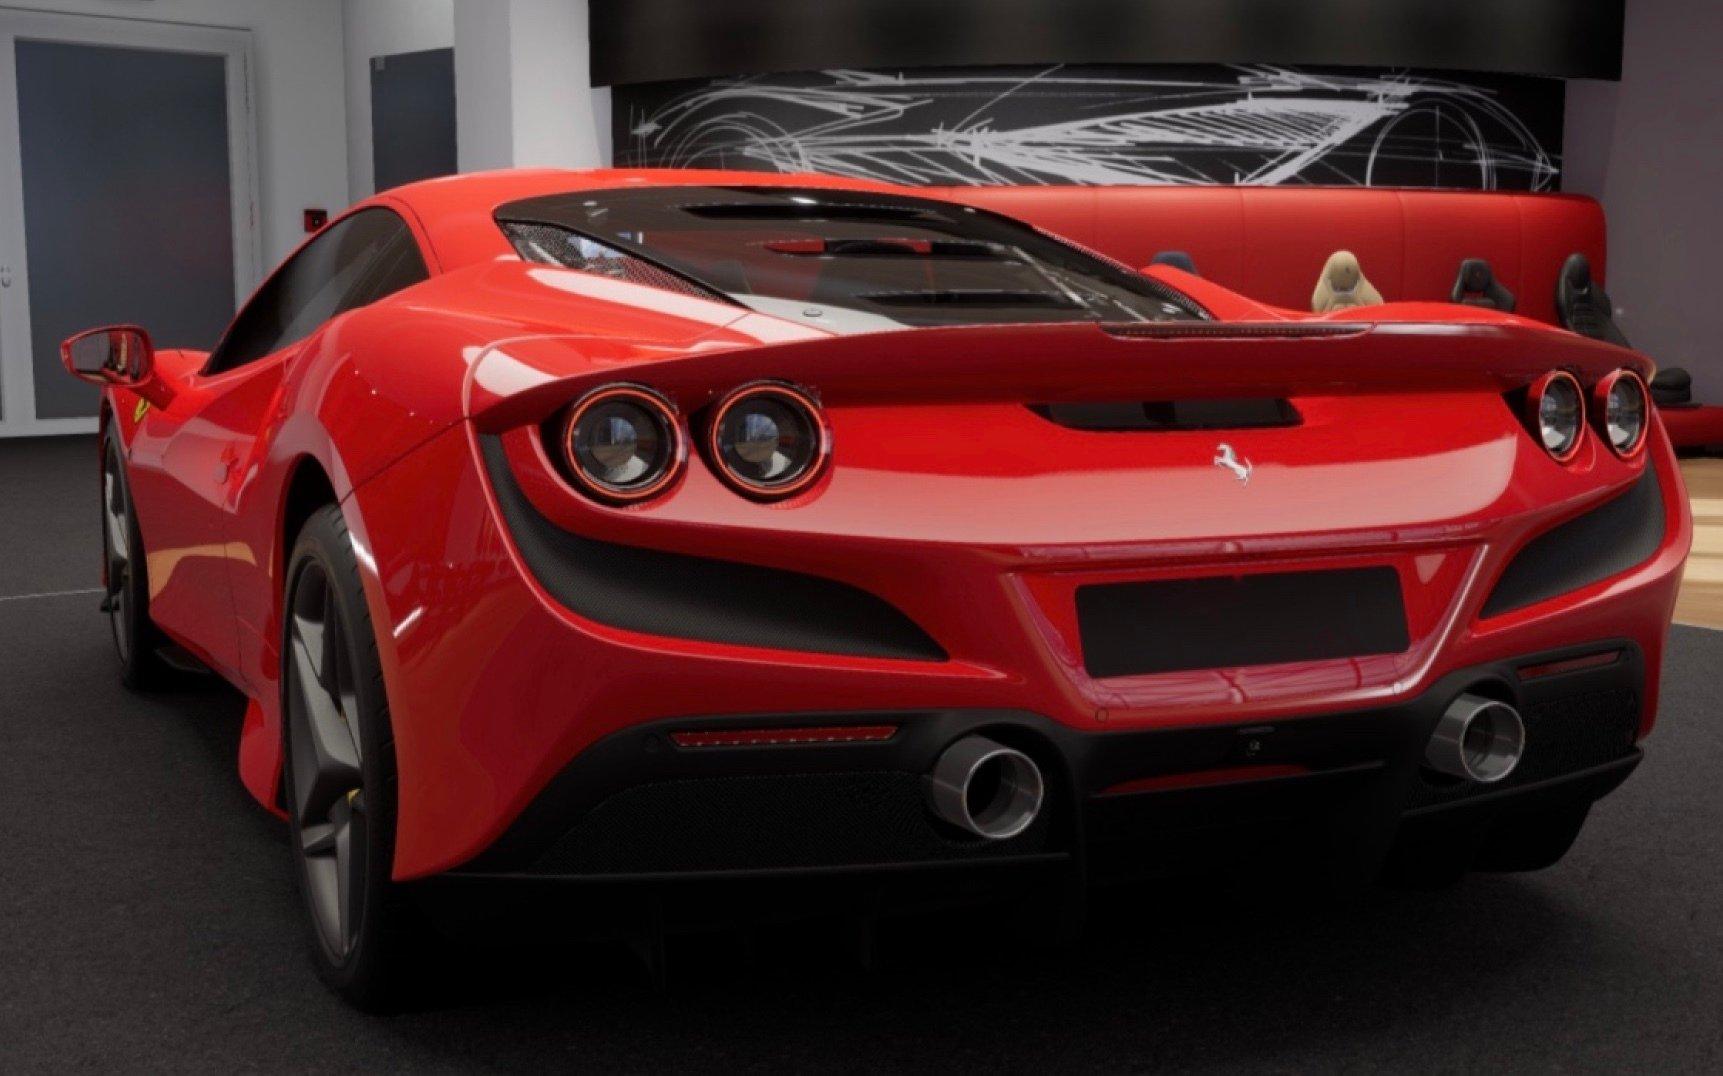 2020 Ferrari Ferrari F8 Tribute in Milan, Italy for sale